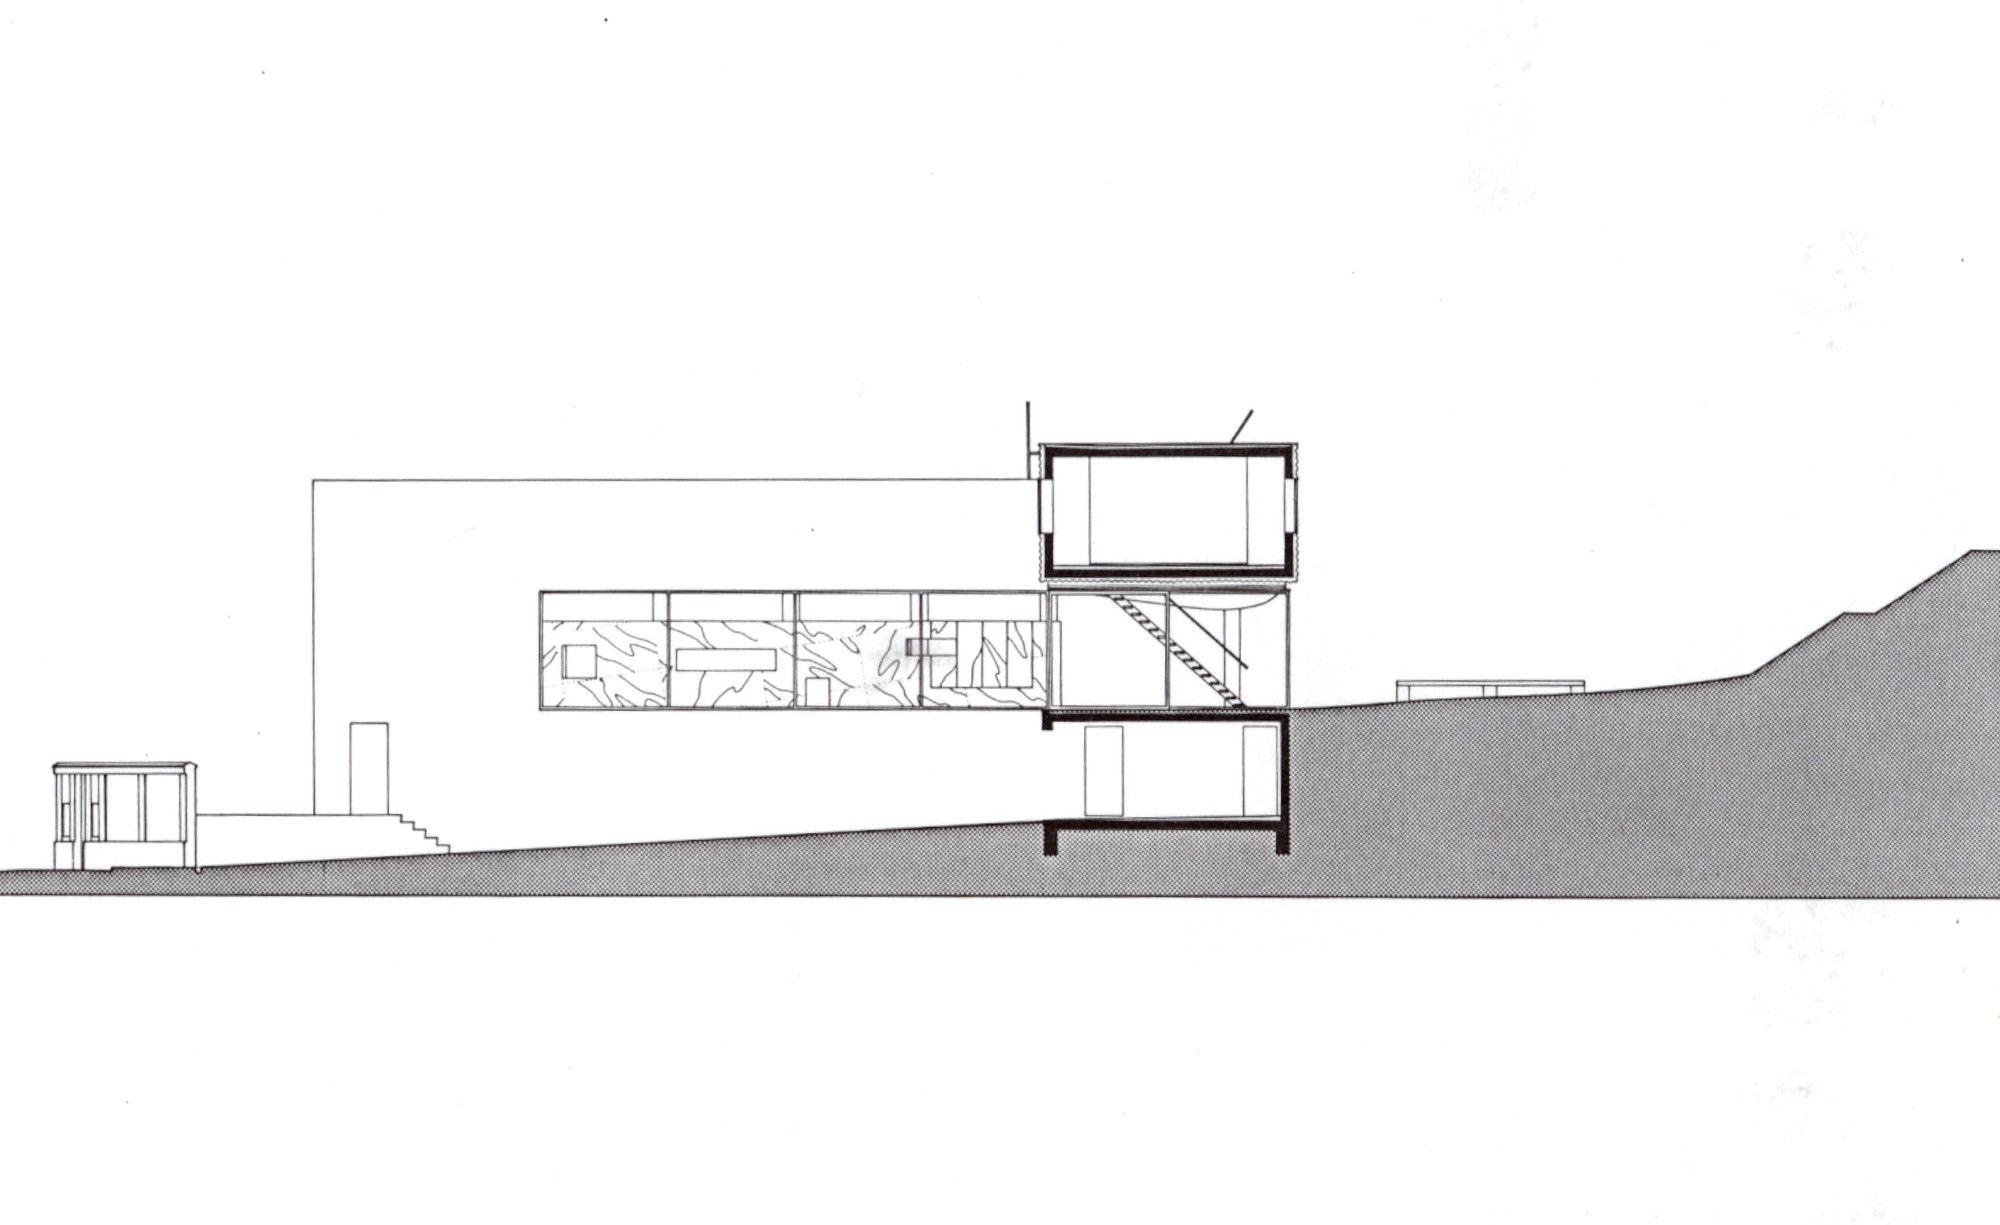 Rem koolhaas villa dall ava paris france 1991 atlas of - Gallery Of Ad Classics Villa Dall Ava Oma 16 Villas Galleries And Classic